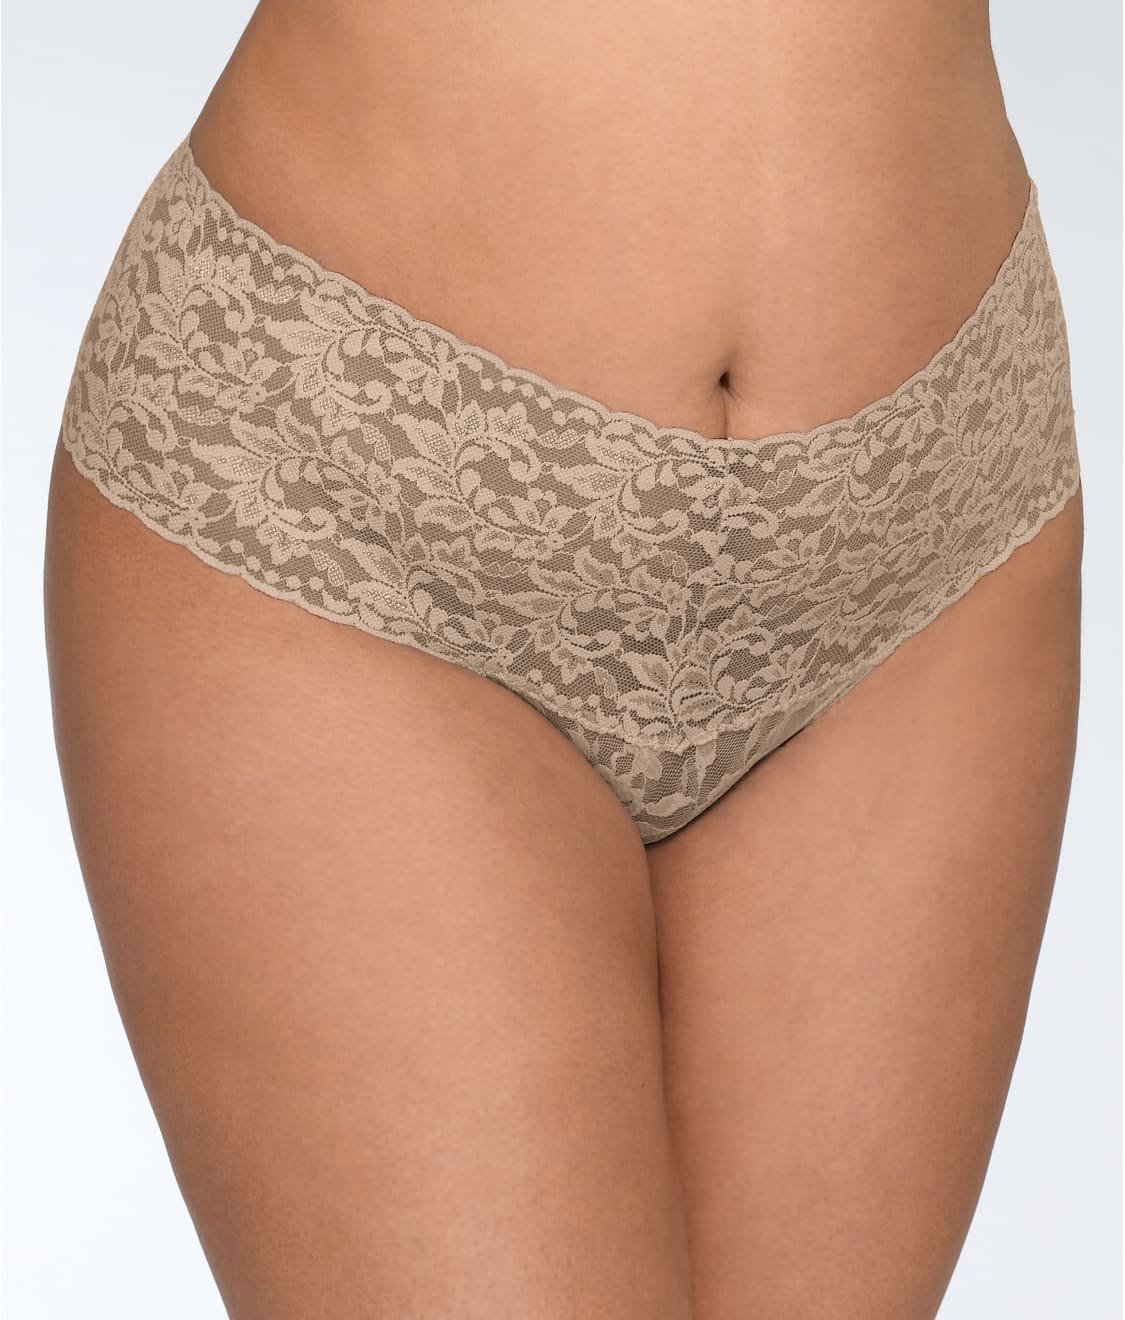 4c7fdb69a Hanky Panky Plus Size Signature Lace Retro Thong